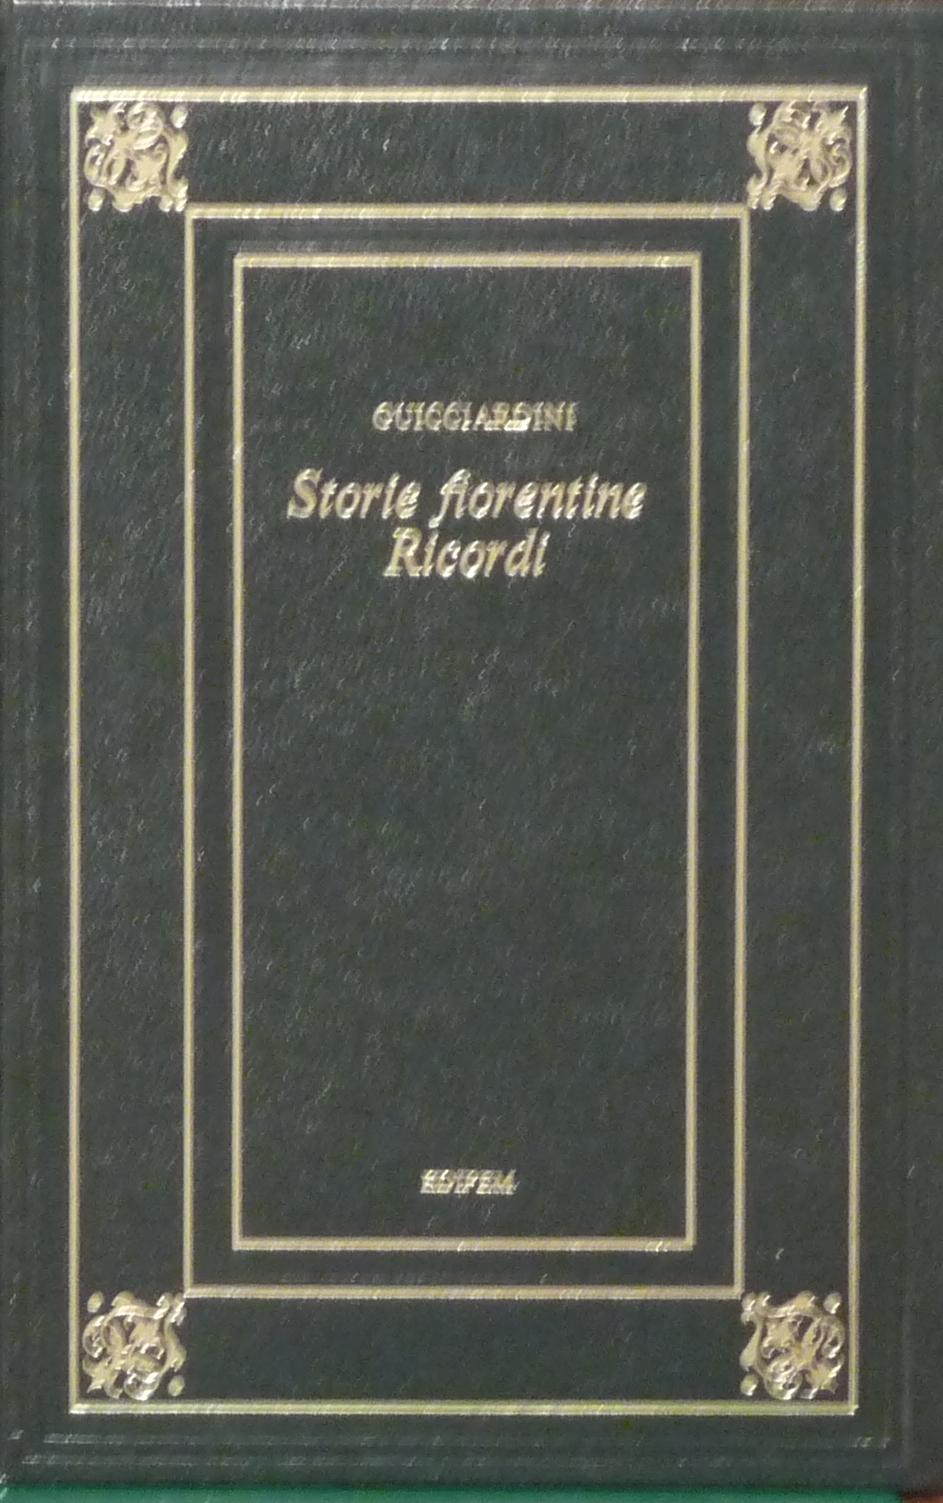 Storie fiorentine - Ricordi